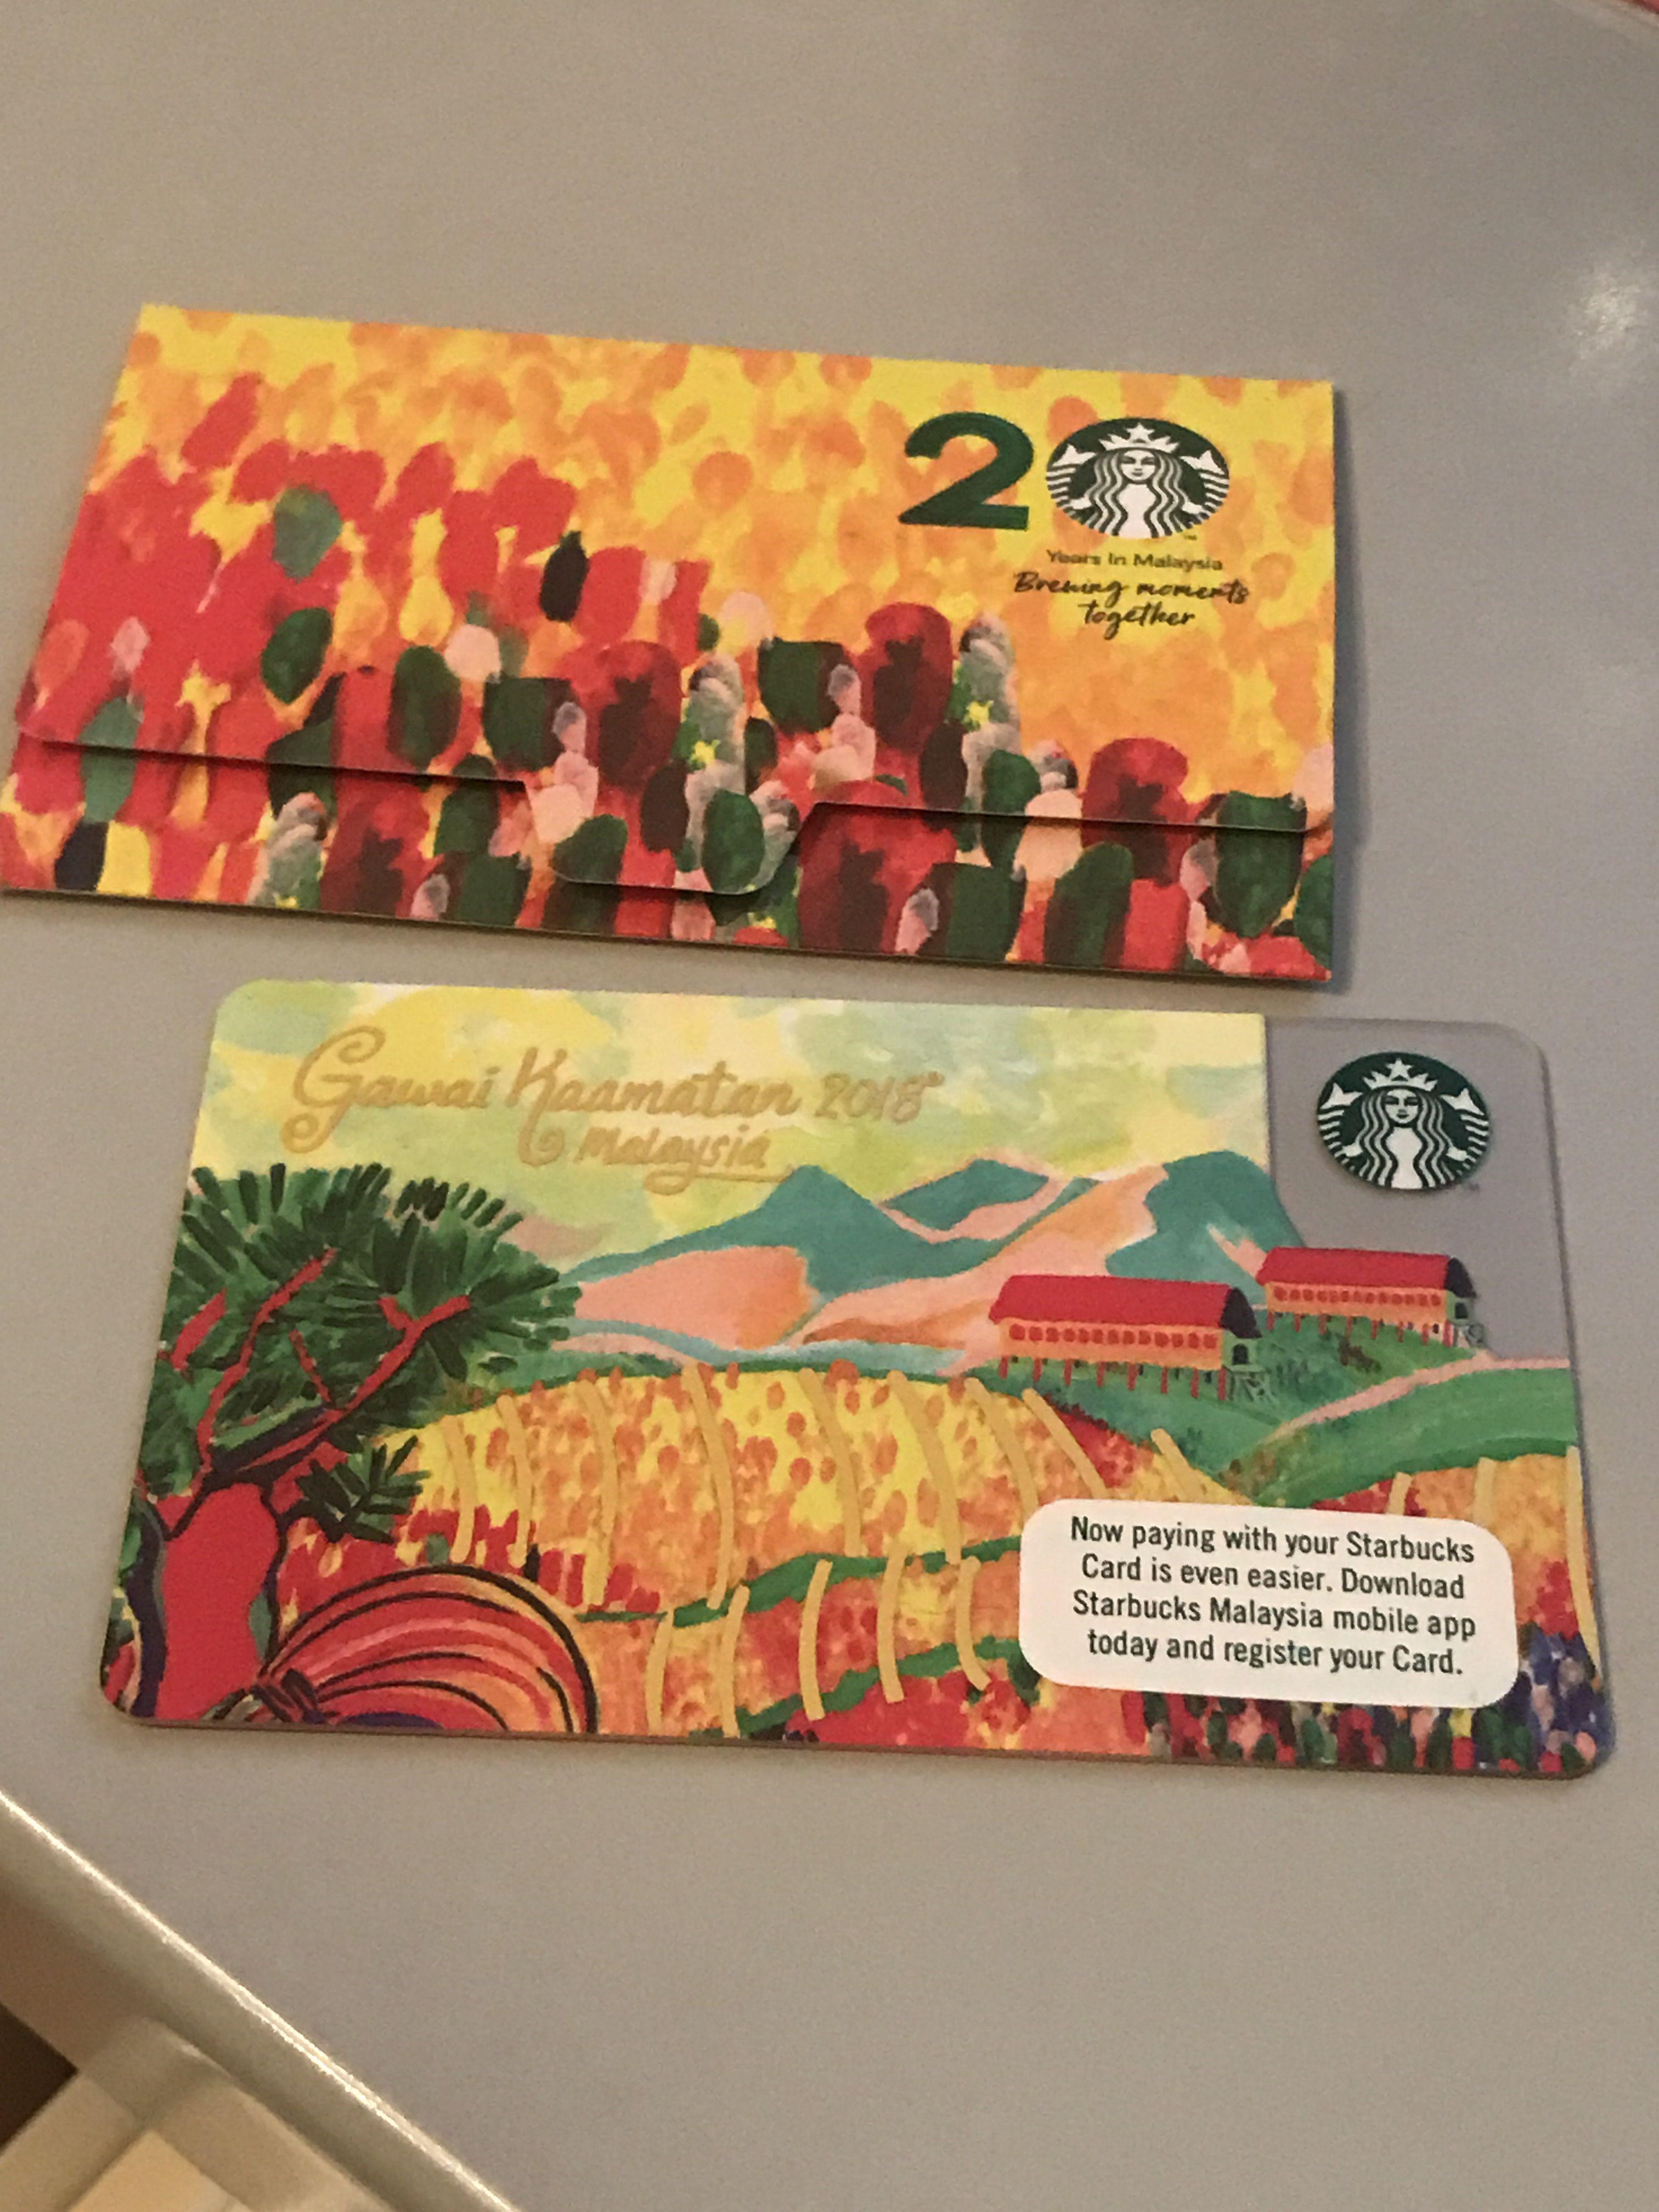 Gawai Kaamatan 2018 Starbucks gift card, Member card